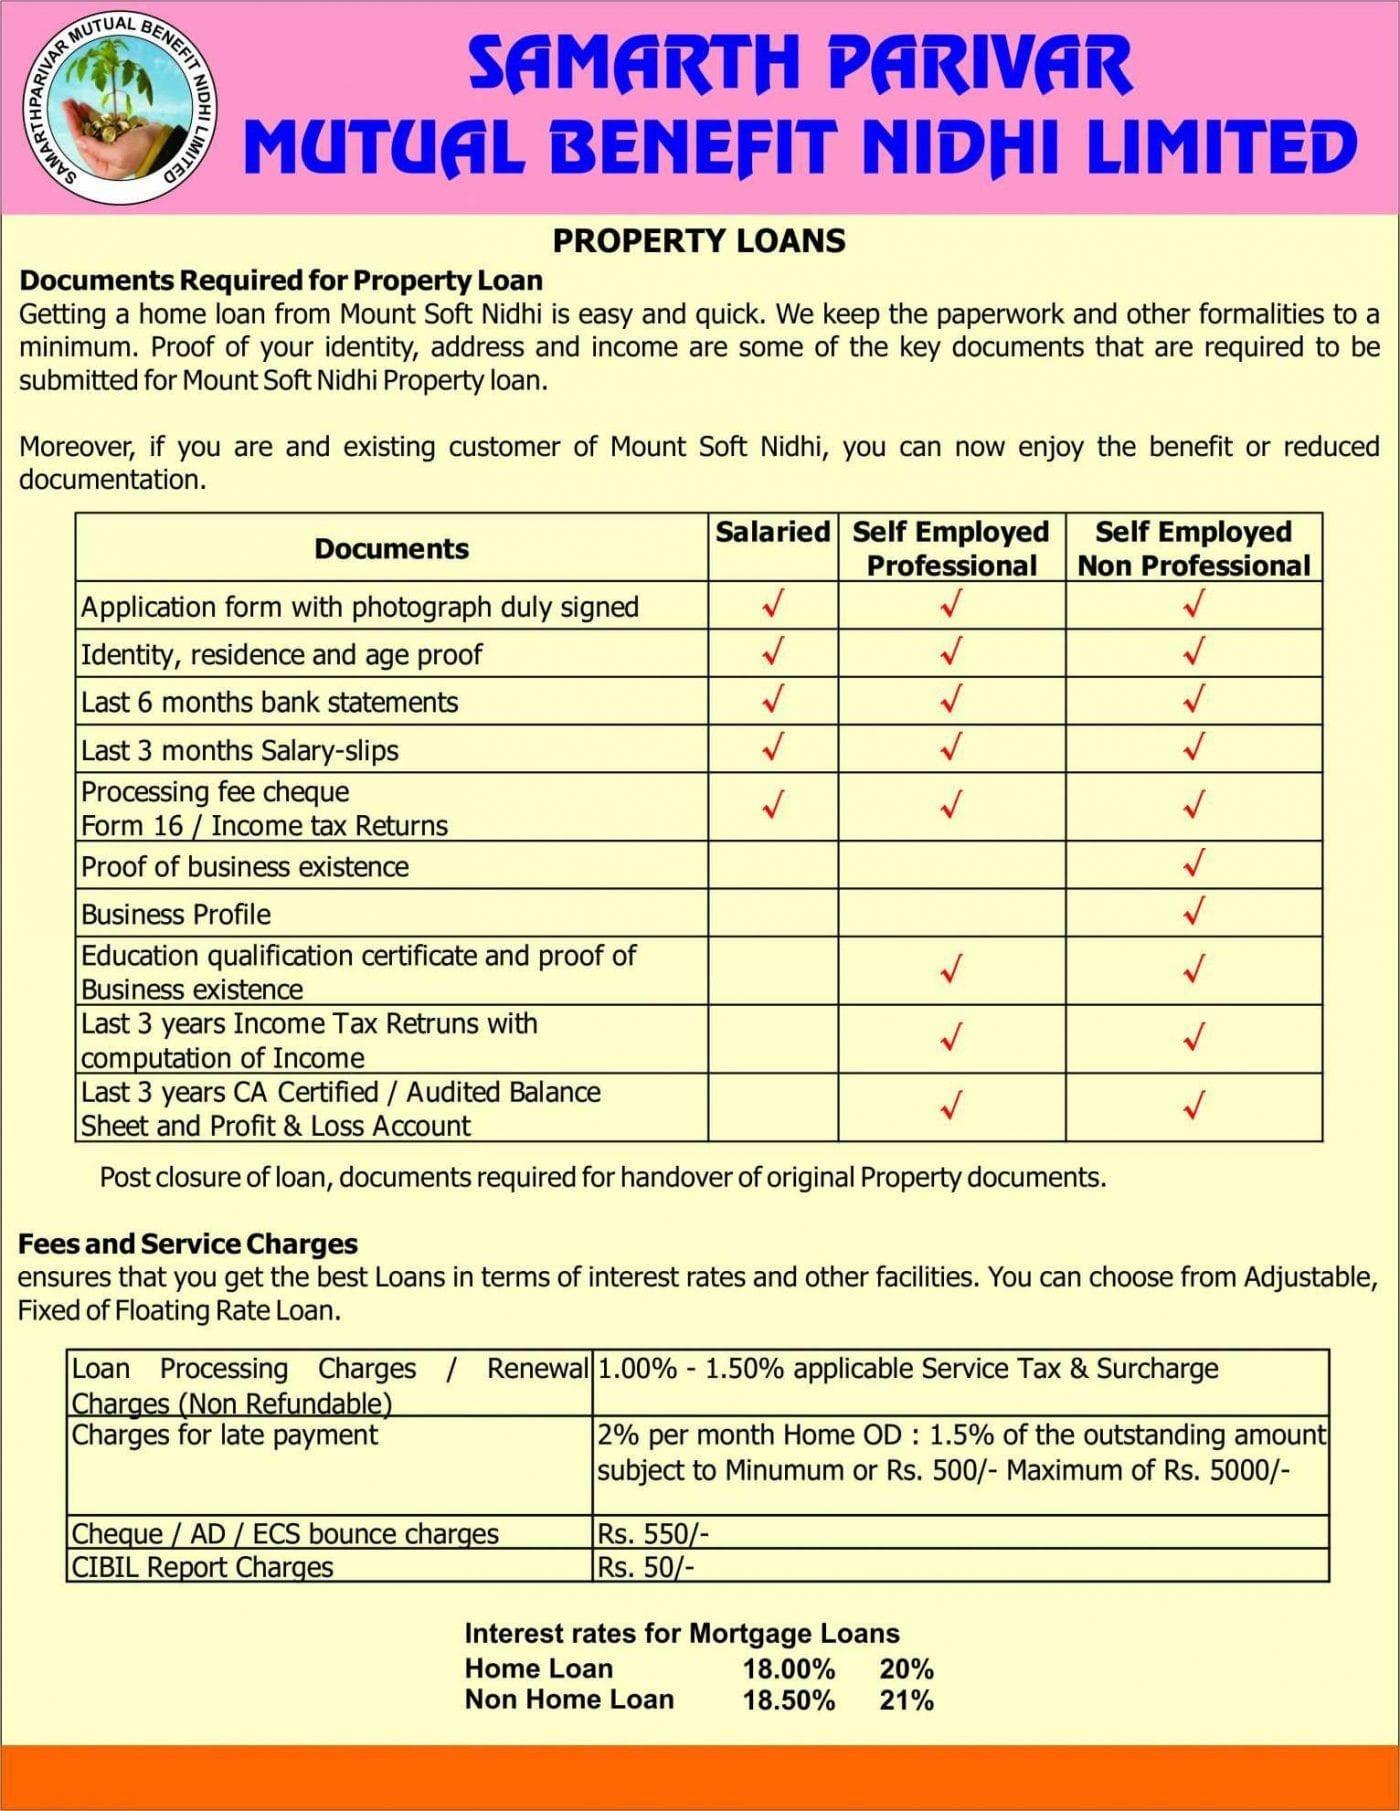 Va Maximum Loan Amount Calculation Worksheet